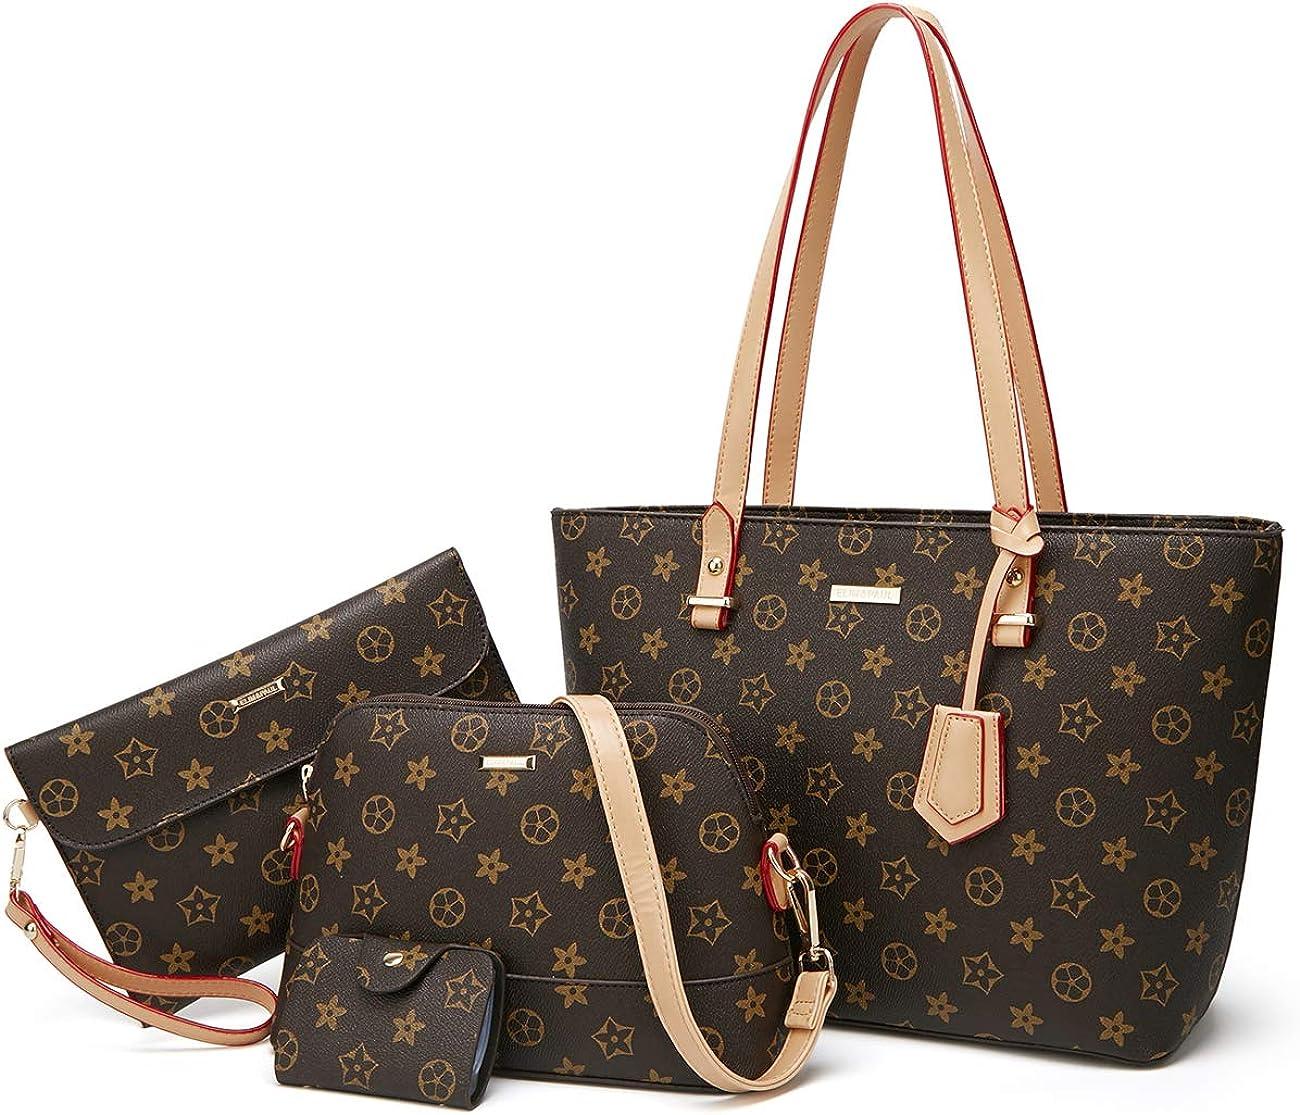 Checkered Handbags for Women Shoulder Bags Tote Satchel Hobo 4pcs Purse Set s for Women Purses Fashion Tote Bags 4pcs